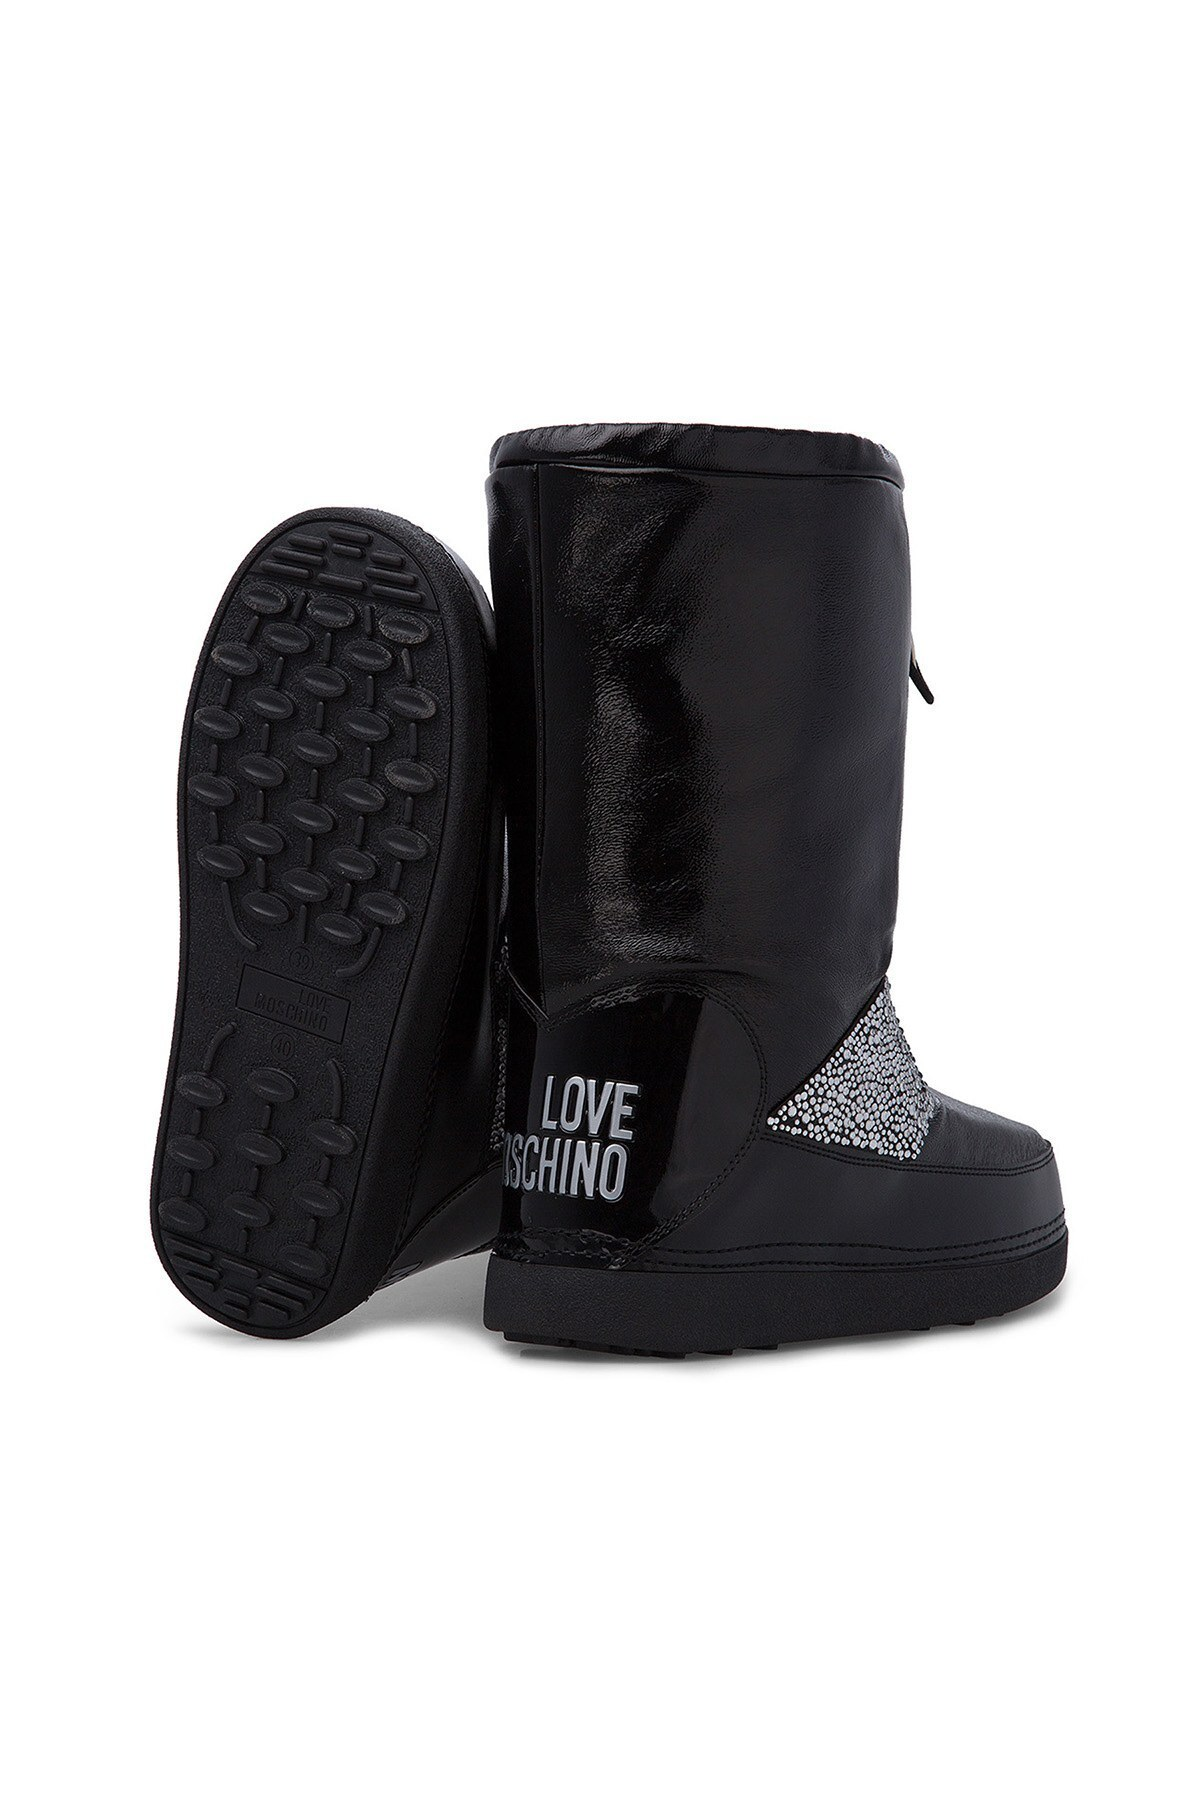 Love Moschino Bayan Kar Botu JA24042G18IE0000 SİYAH